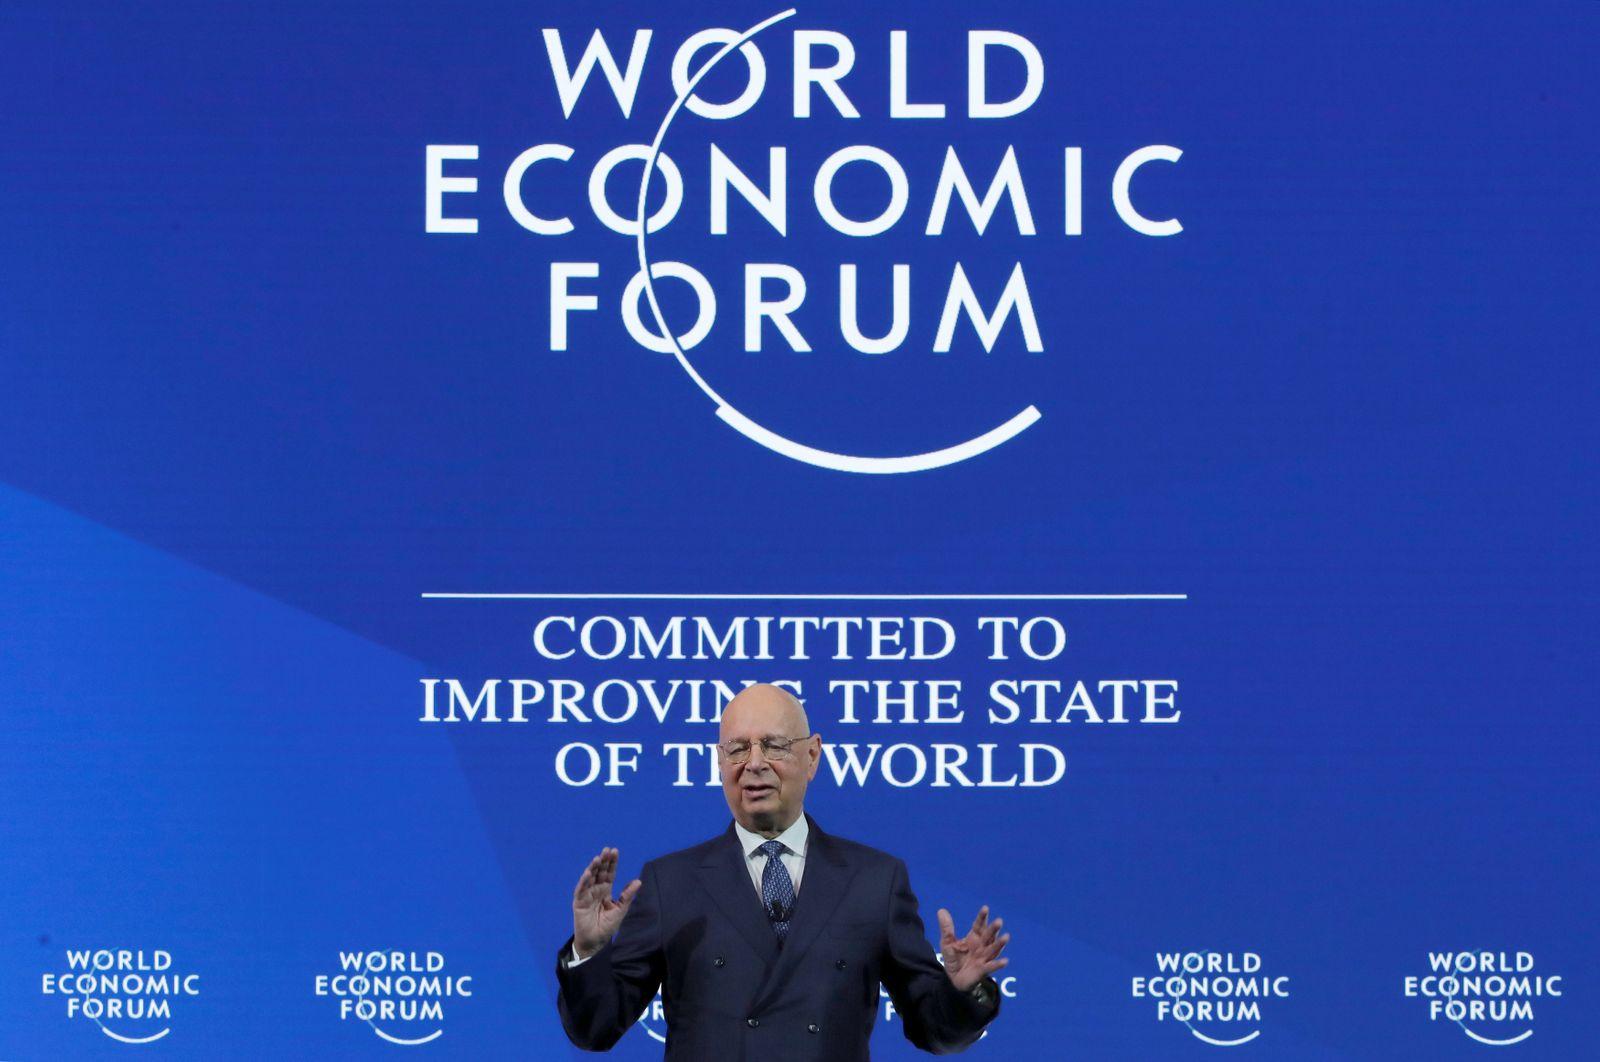 Klaus Schwab / World Economic Forum